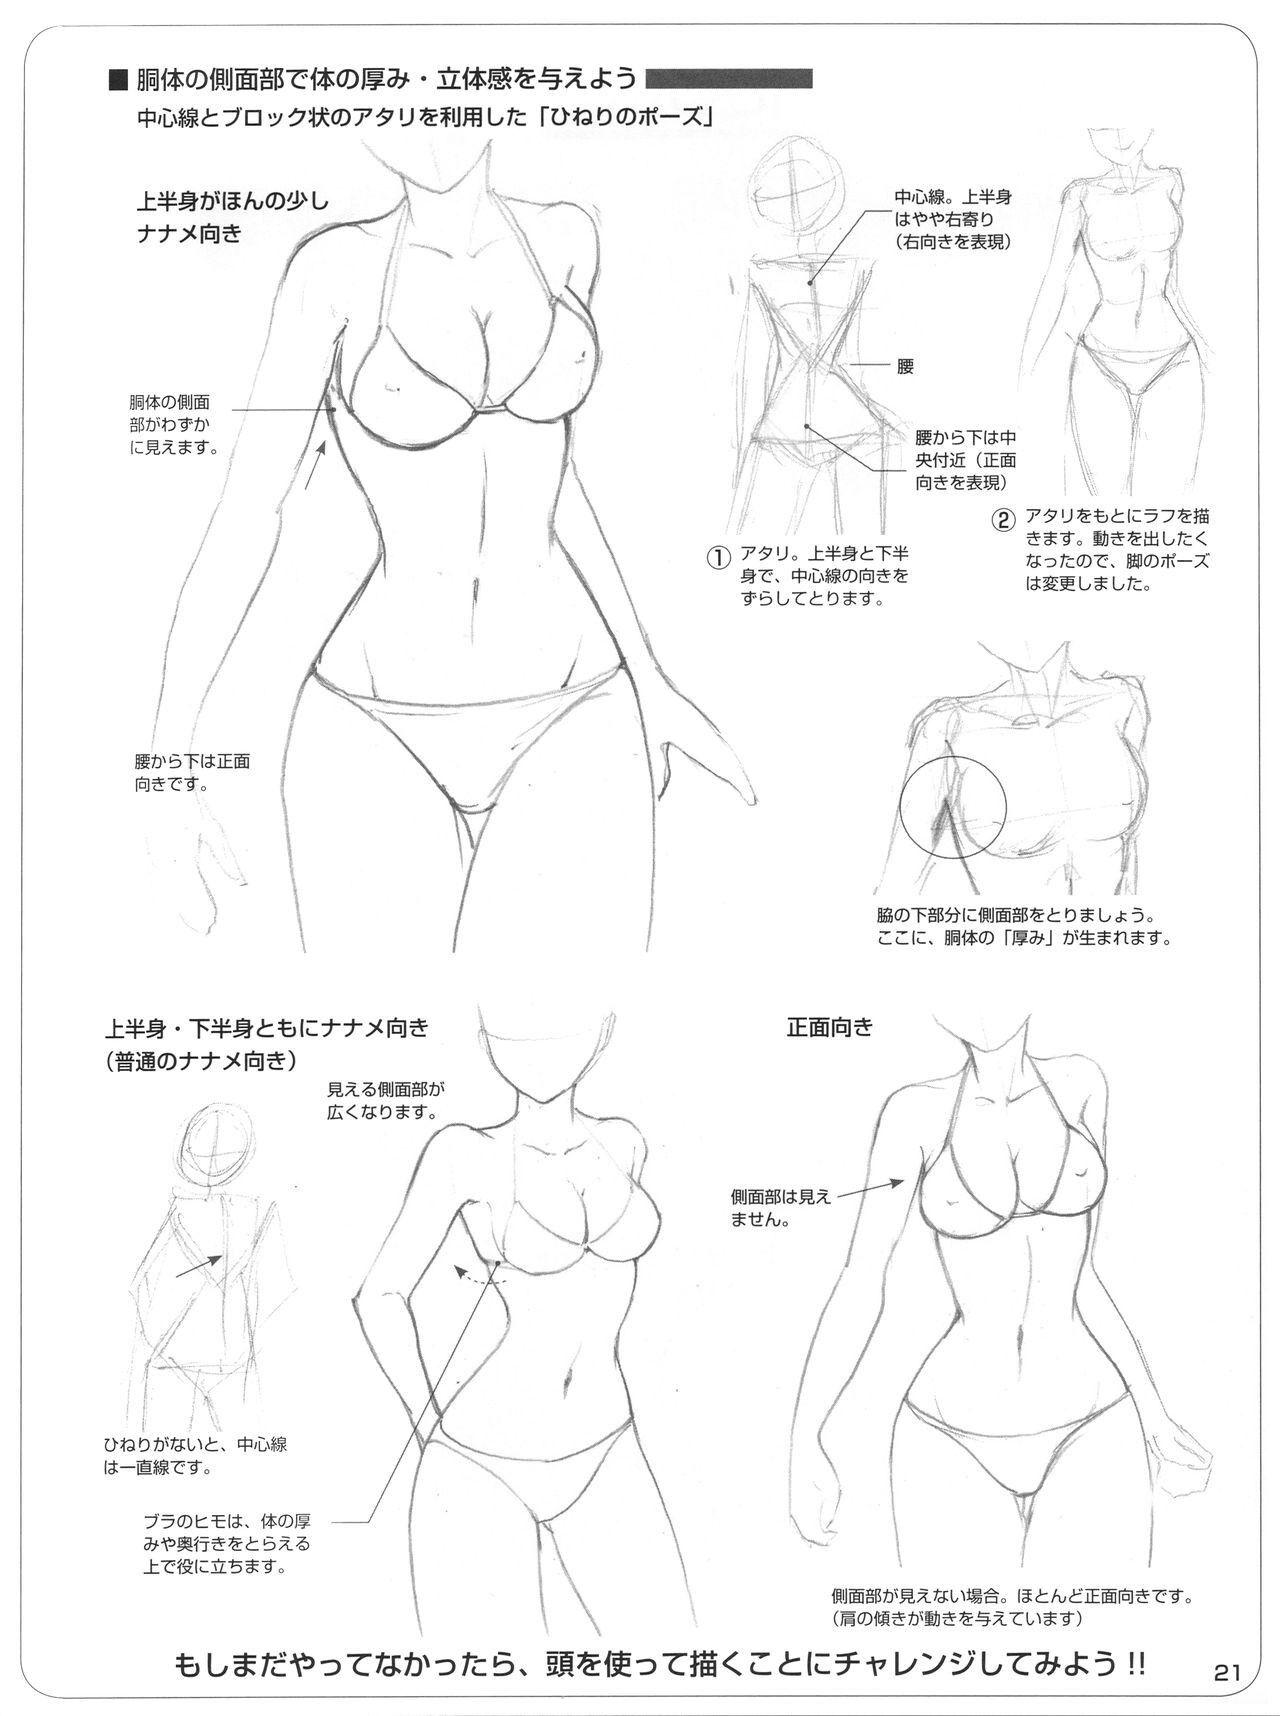 Pin by Lars Pope on Female Anatomy Sketch | Pinterest | Drawings ...